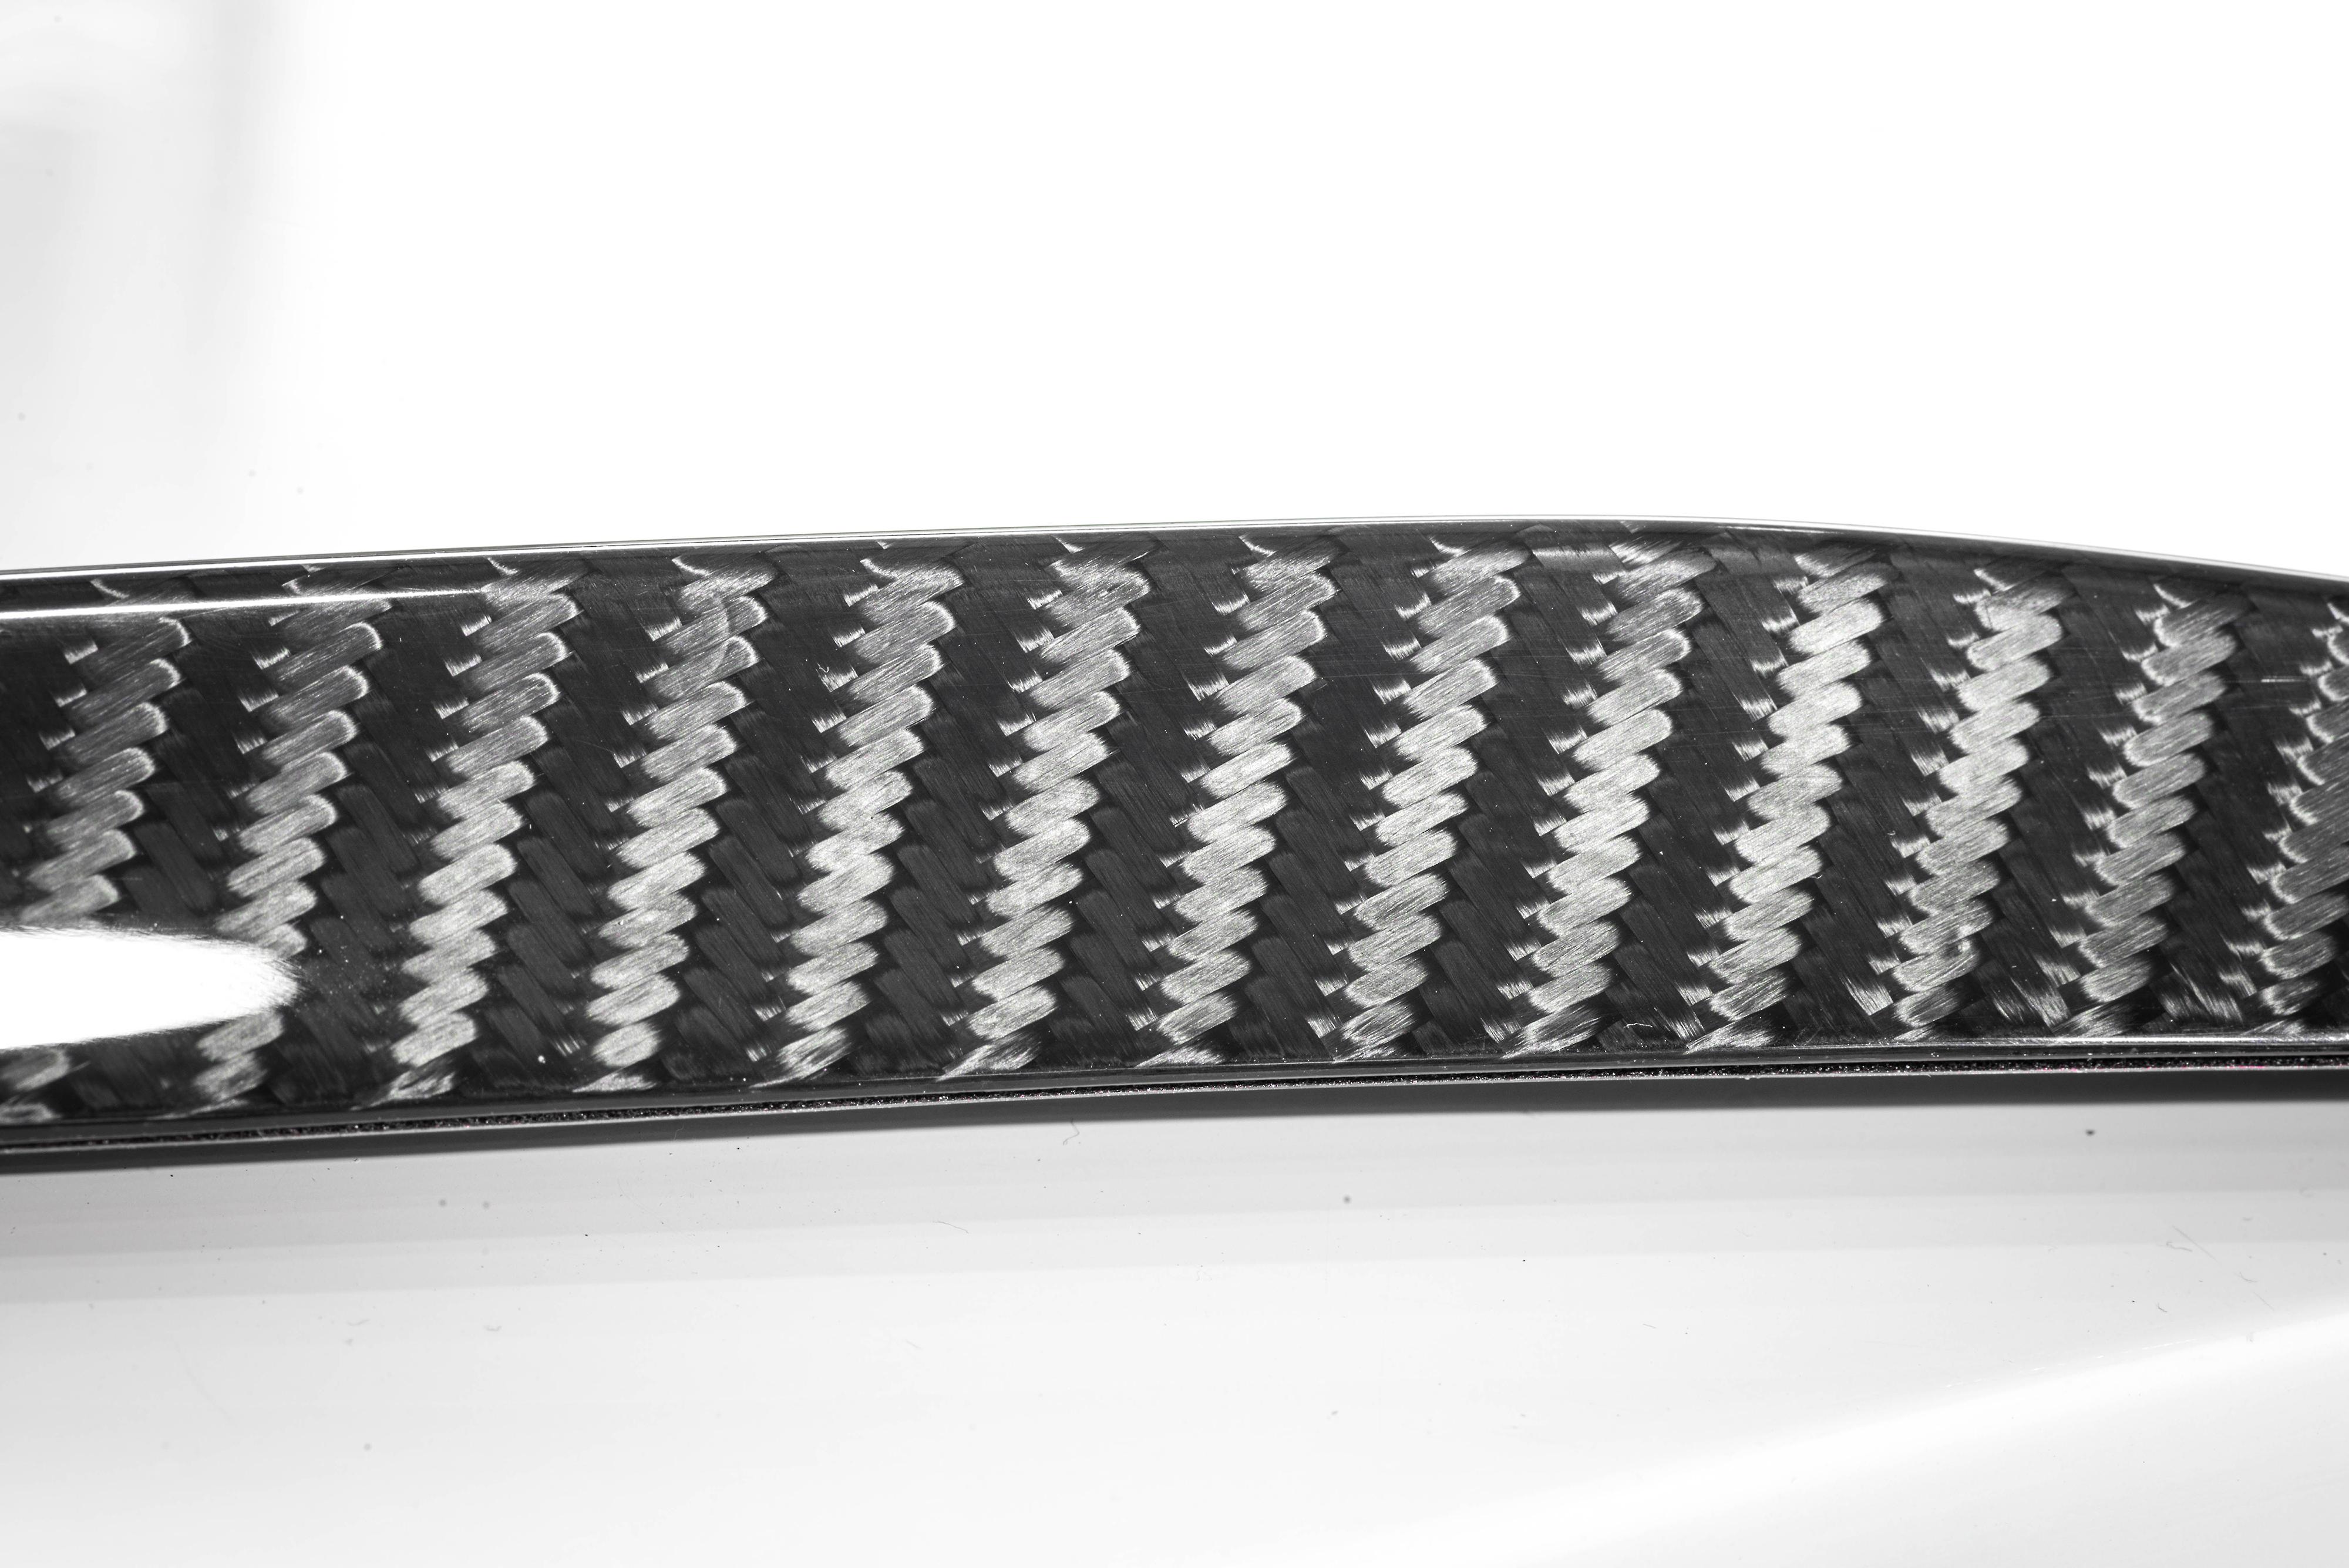 Mercedes carbon fiber rear spoiler